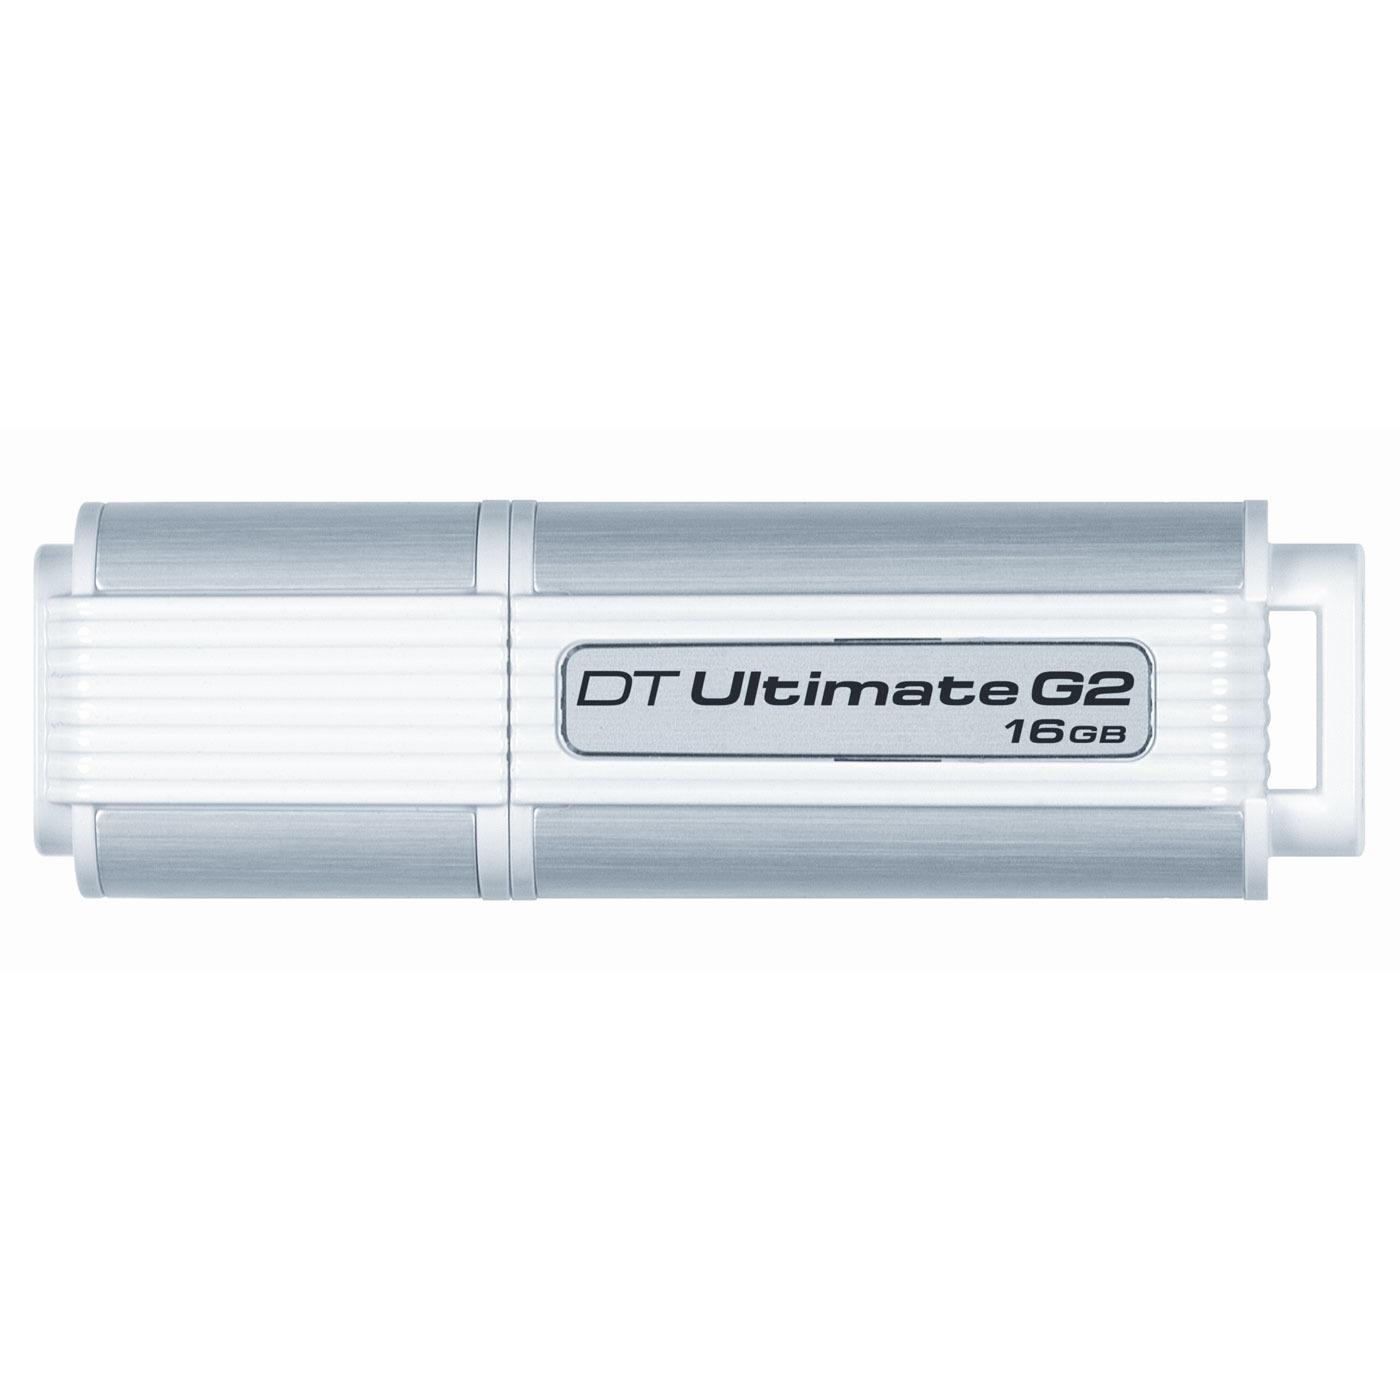 Clé USB Kingston DataTraveler Ultimate 3.0 G2 16 Go Kingston DataTraveler Ultimate 3.0 G2 16 Go - USB 3.0 (garantie constructeur 5 ans)